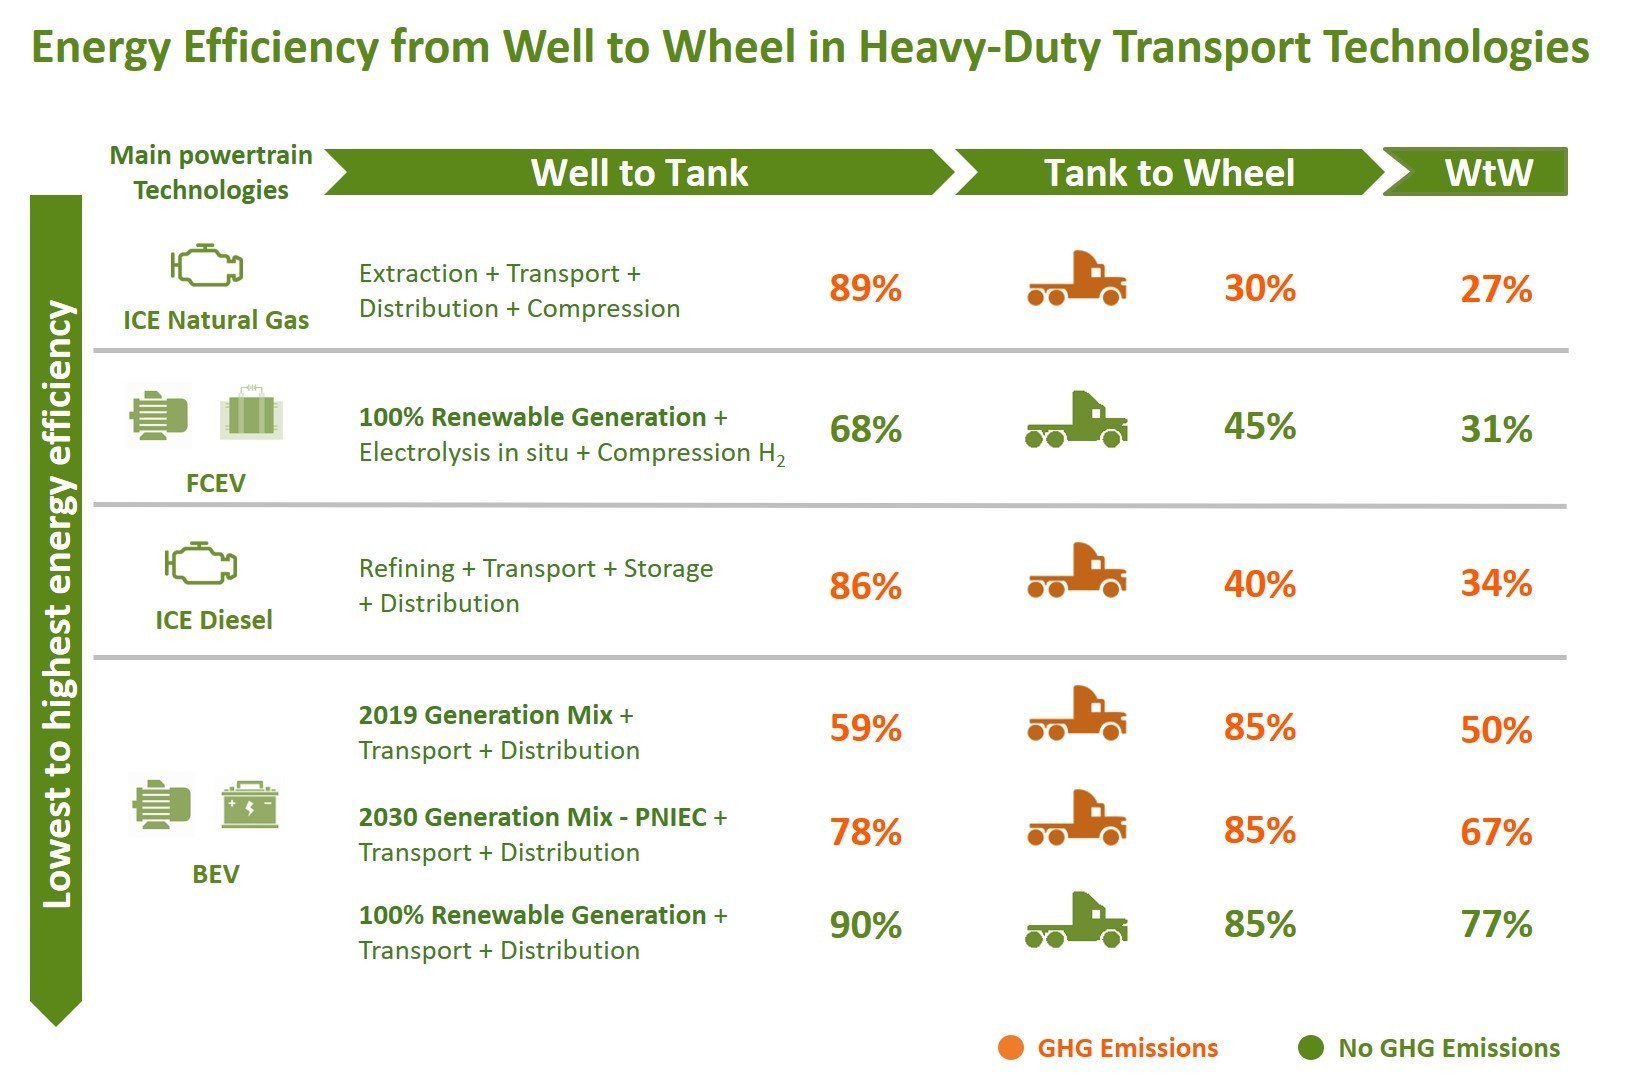 Energy efficiency from well to wheel in heavy-duty transport technologies. Source: Iberdrola.